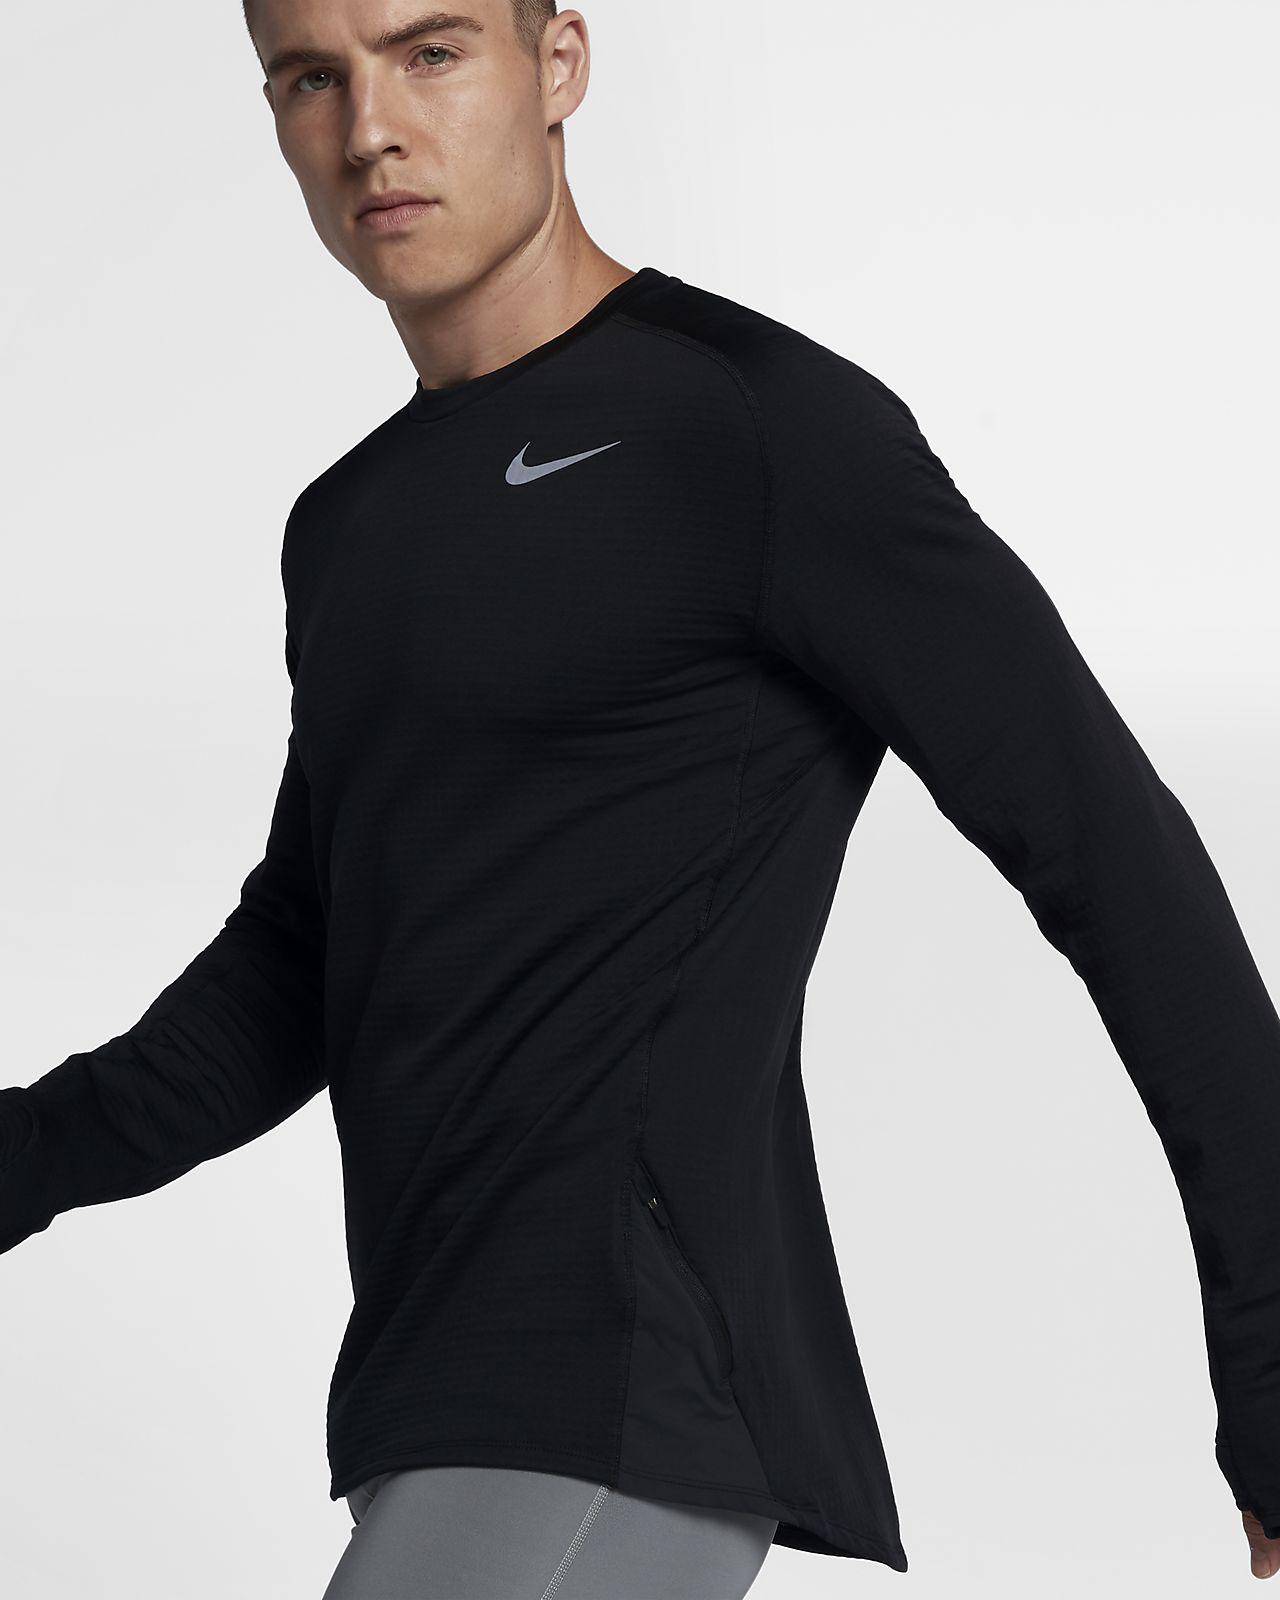 Långärmad löpartröja Nike Therma Sphere för män